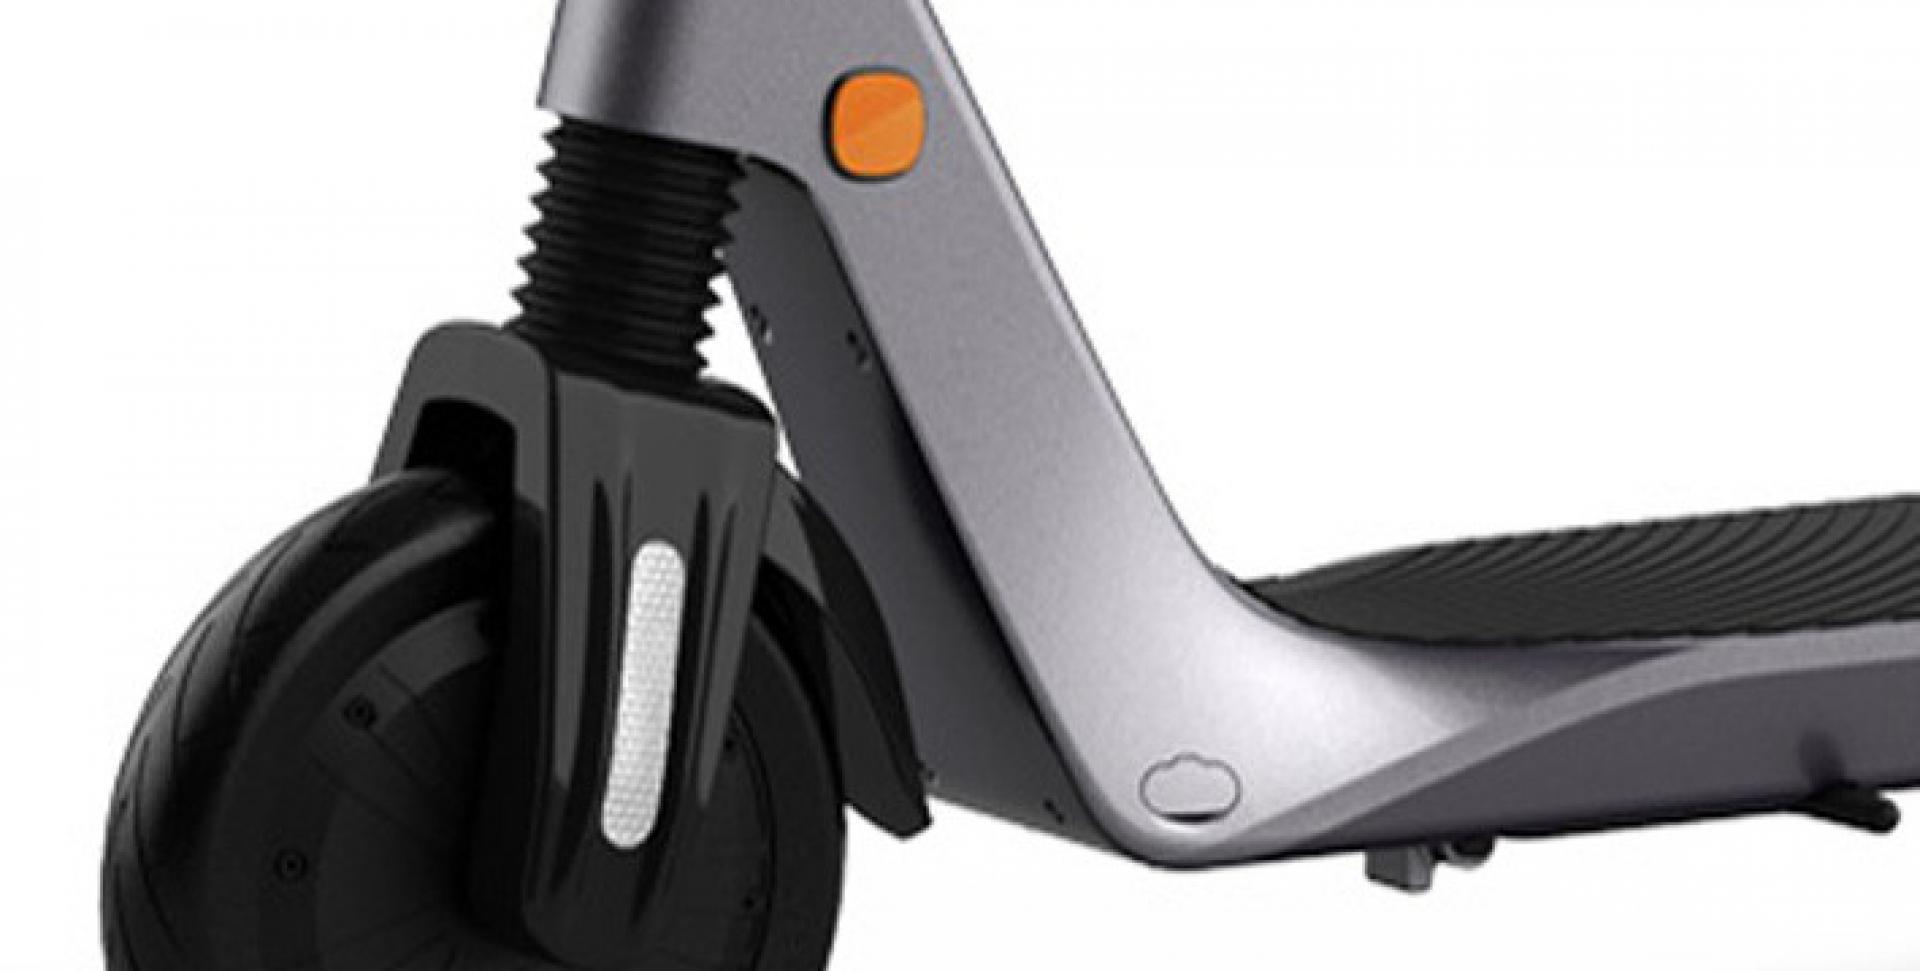 okai--one-electric-scooter-consumer-motor-q 2.jpg